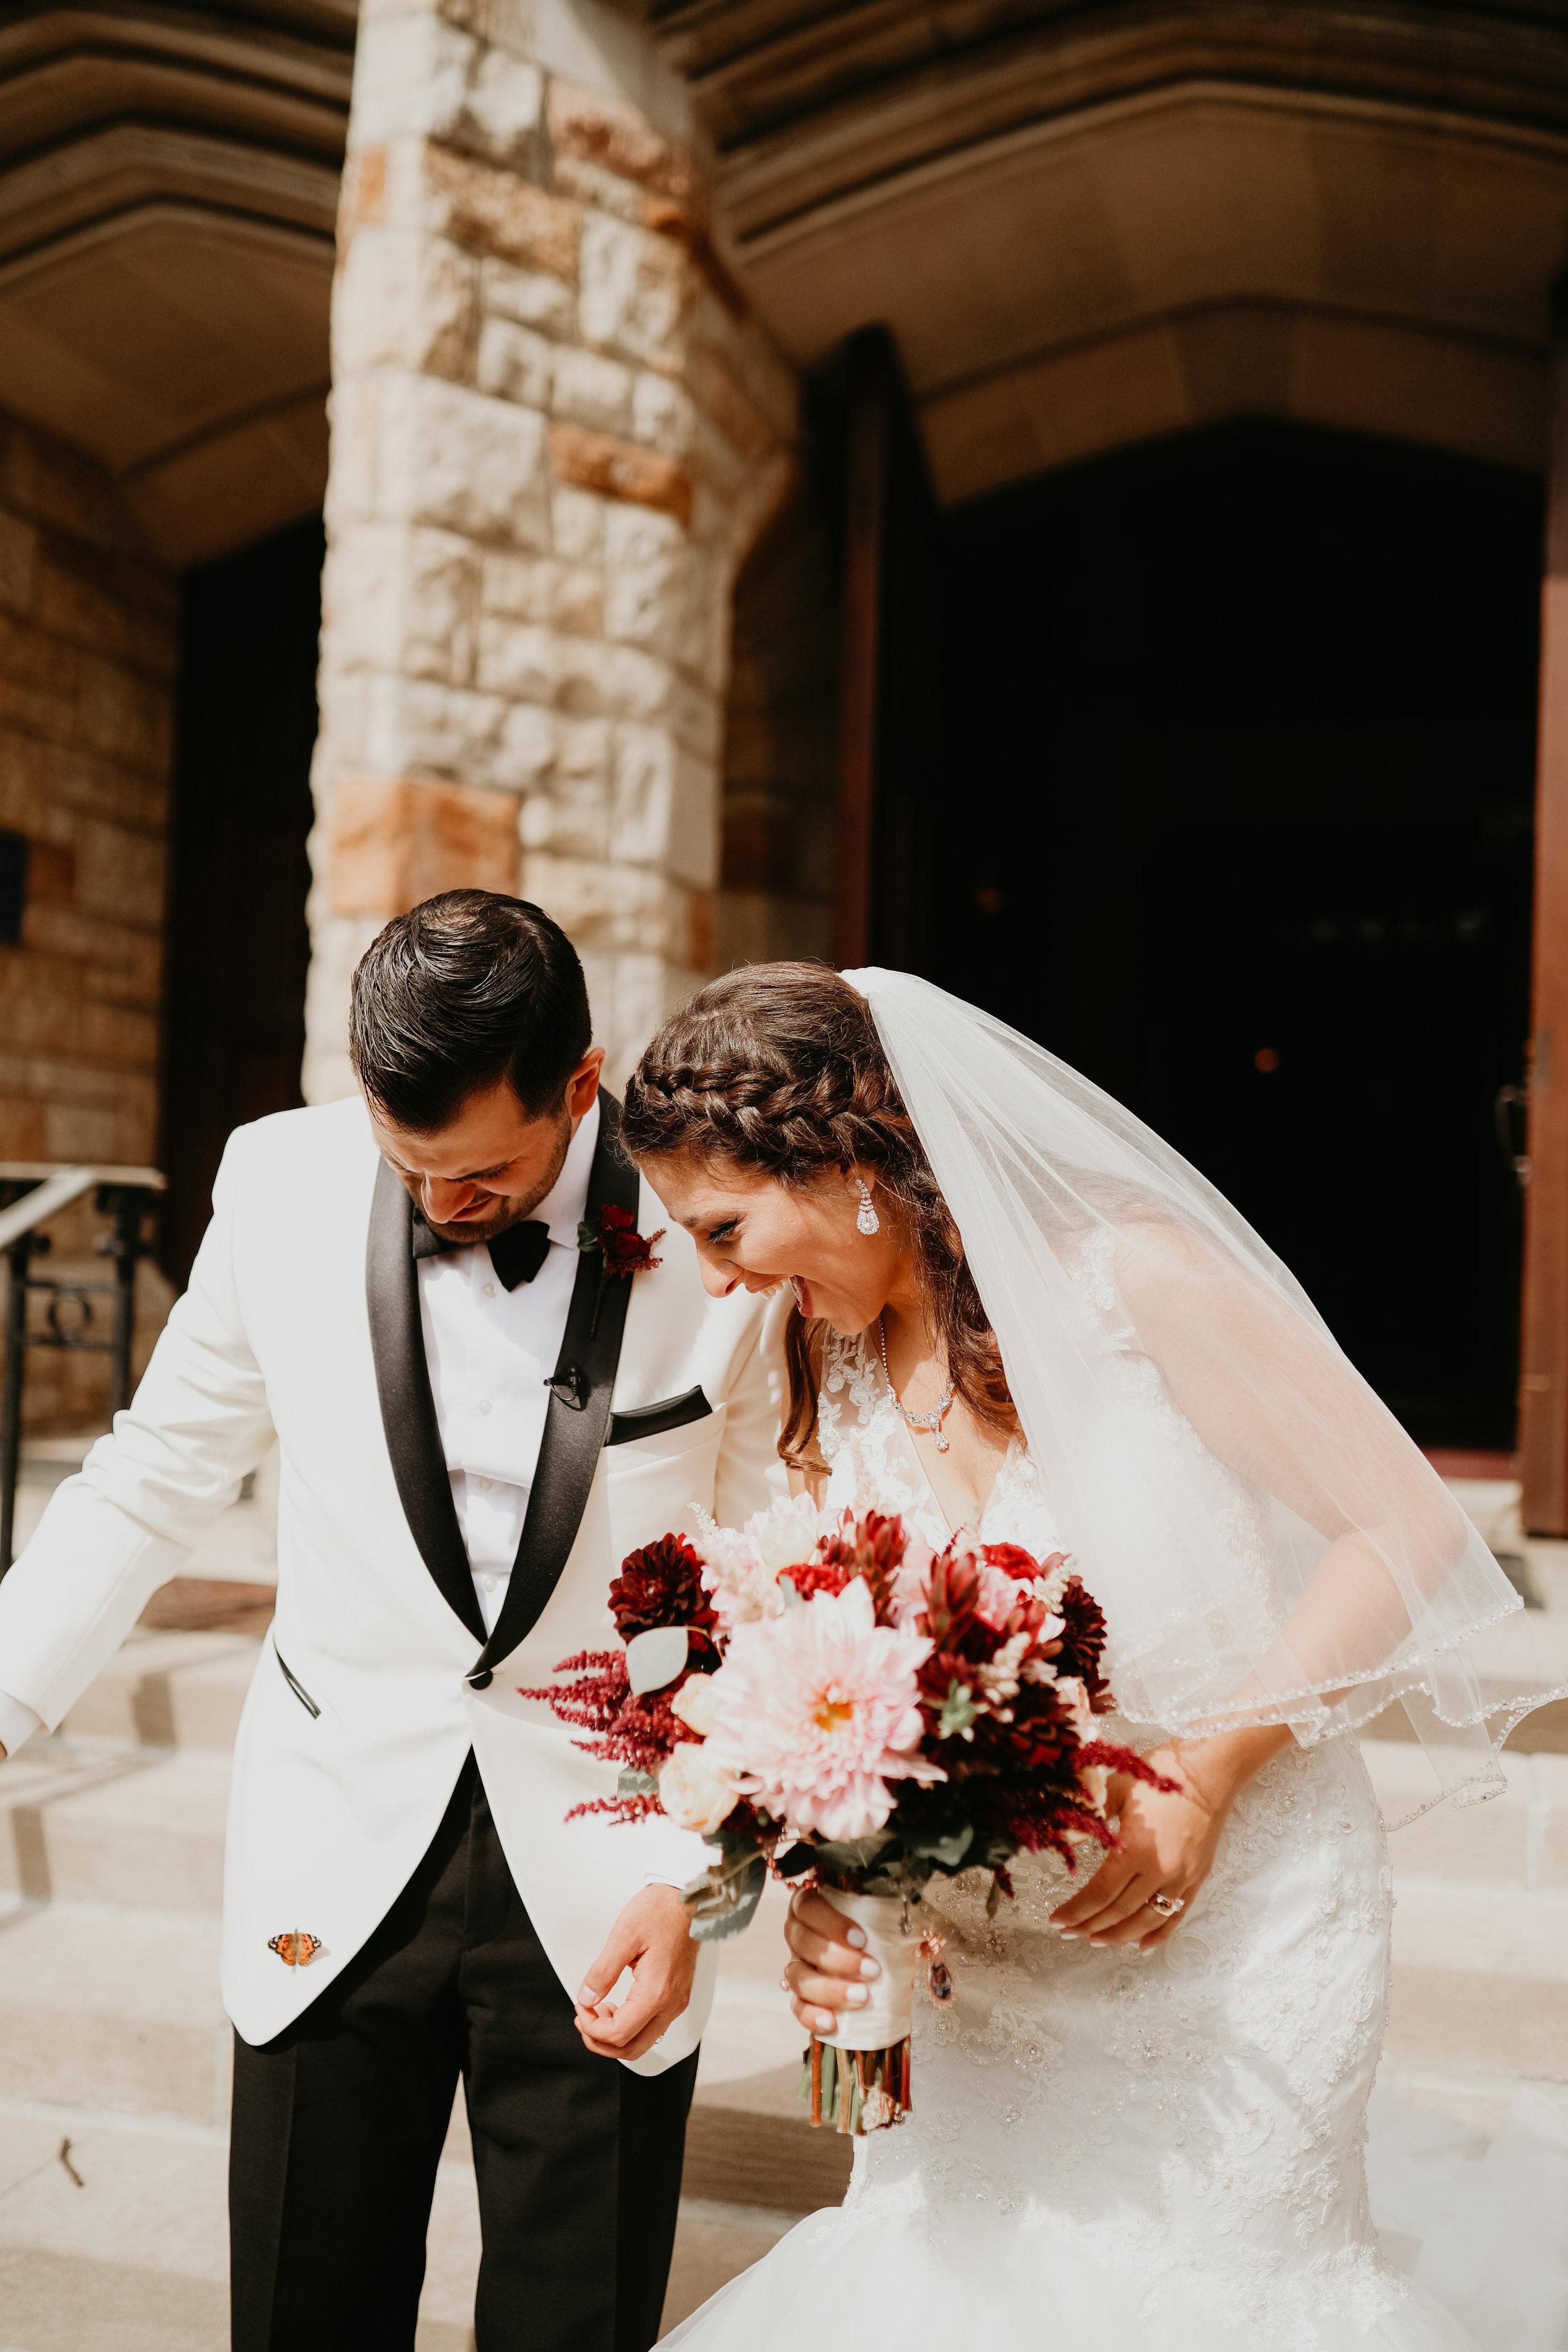 Gina + Ronnie Wedding 78 (1 of 1).jpg